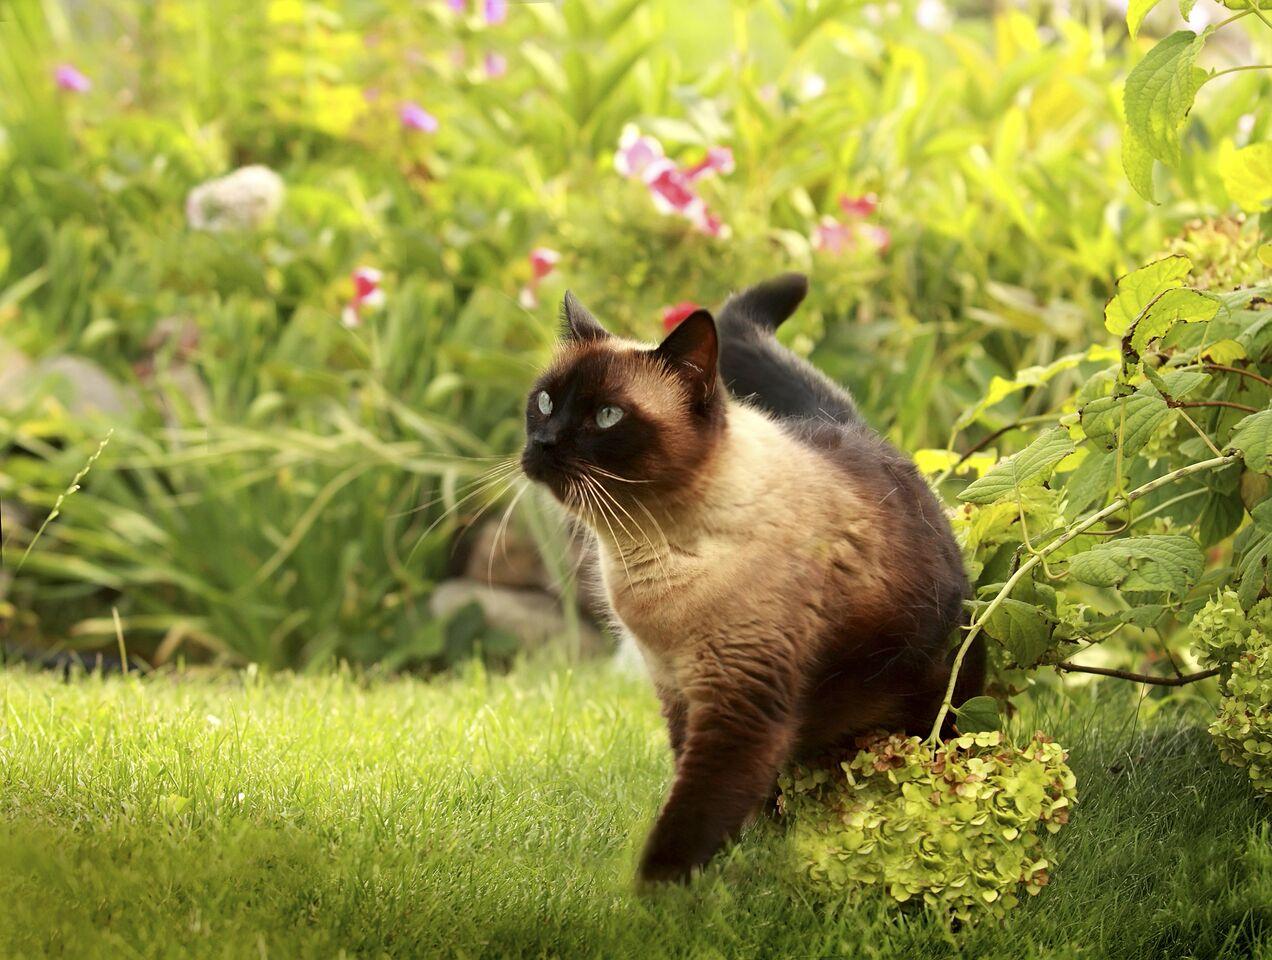 Cat roaming in a garden of flowers